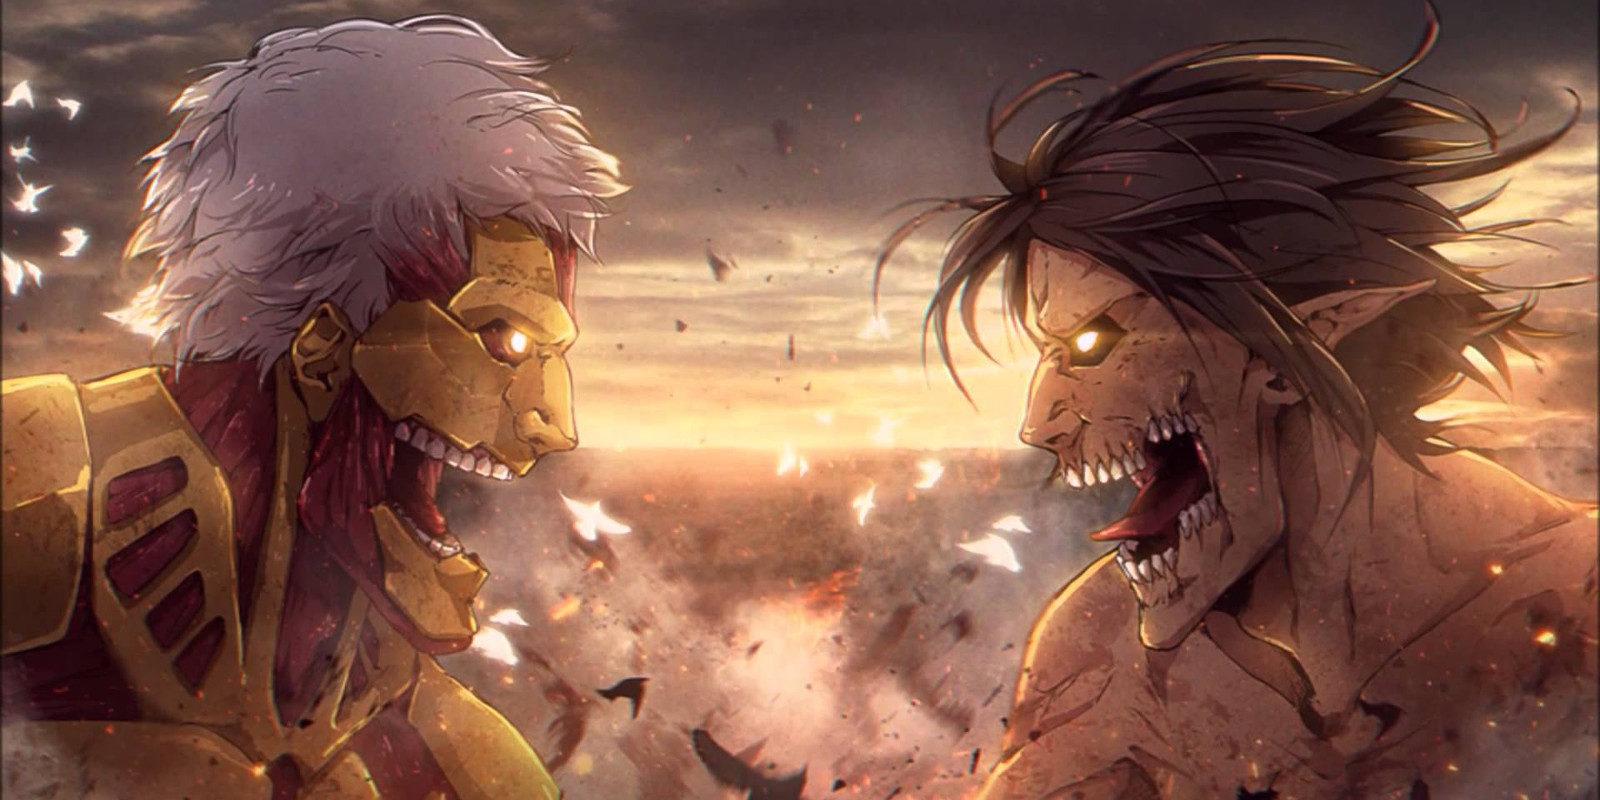 Crítica Ataque A Los Titanes Segunda Temporada Zonared